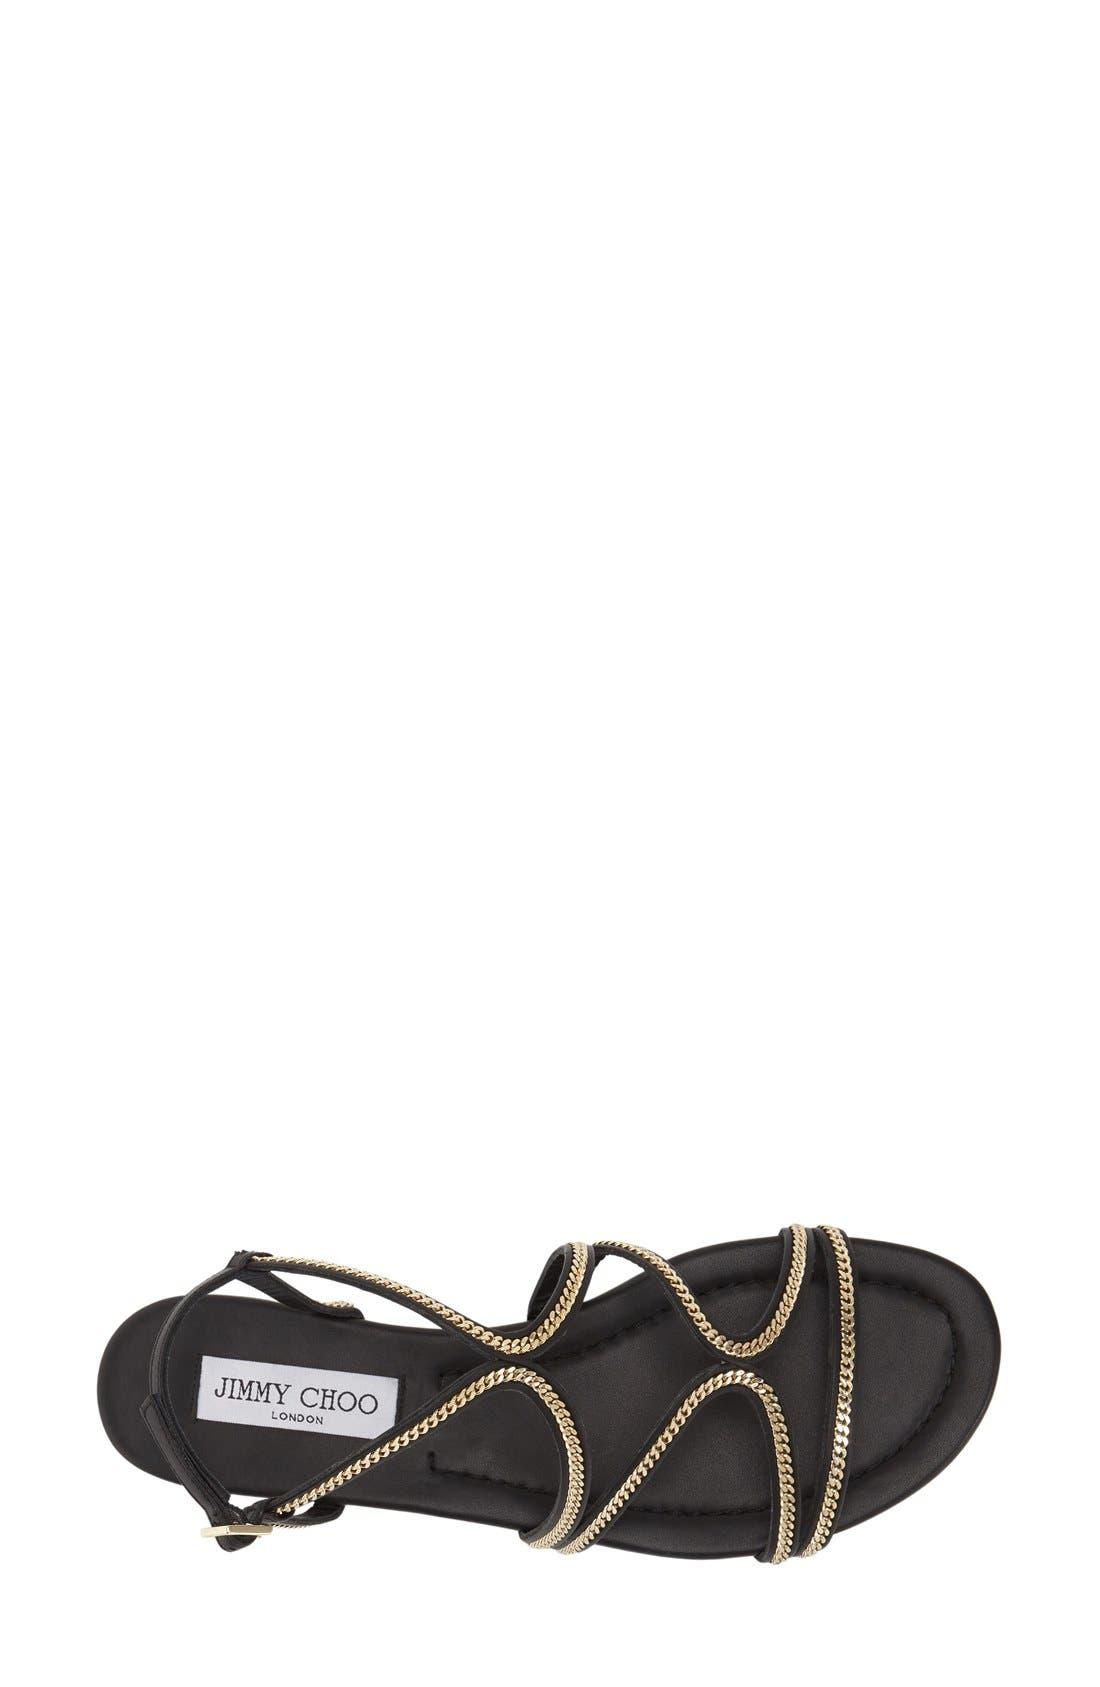 'Nickel' Sandal,                             Alternate thumbnail 3, color,                             Black Leather